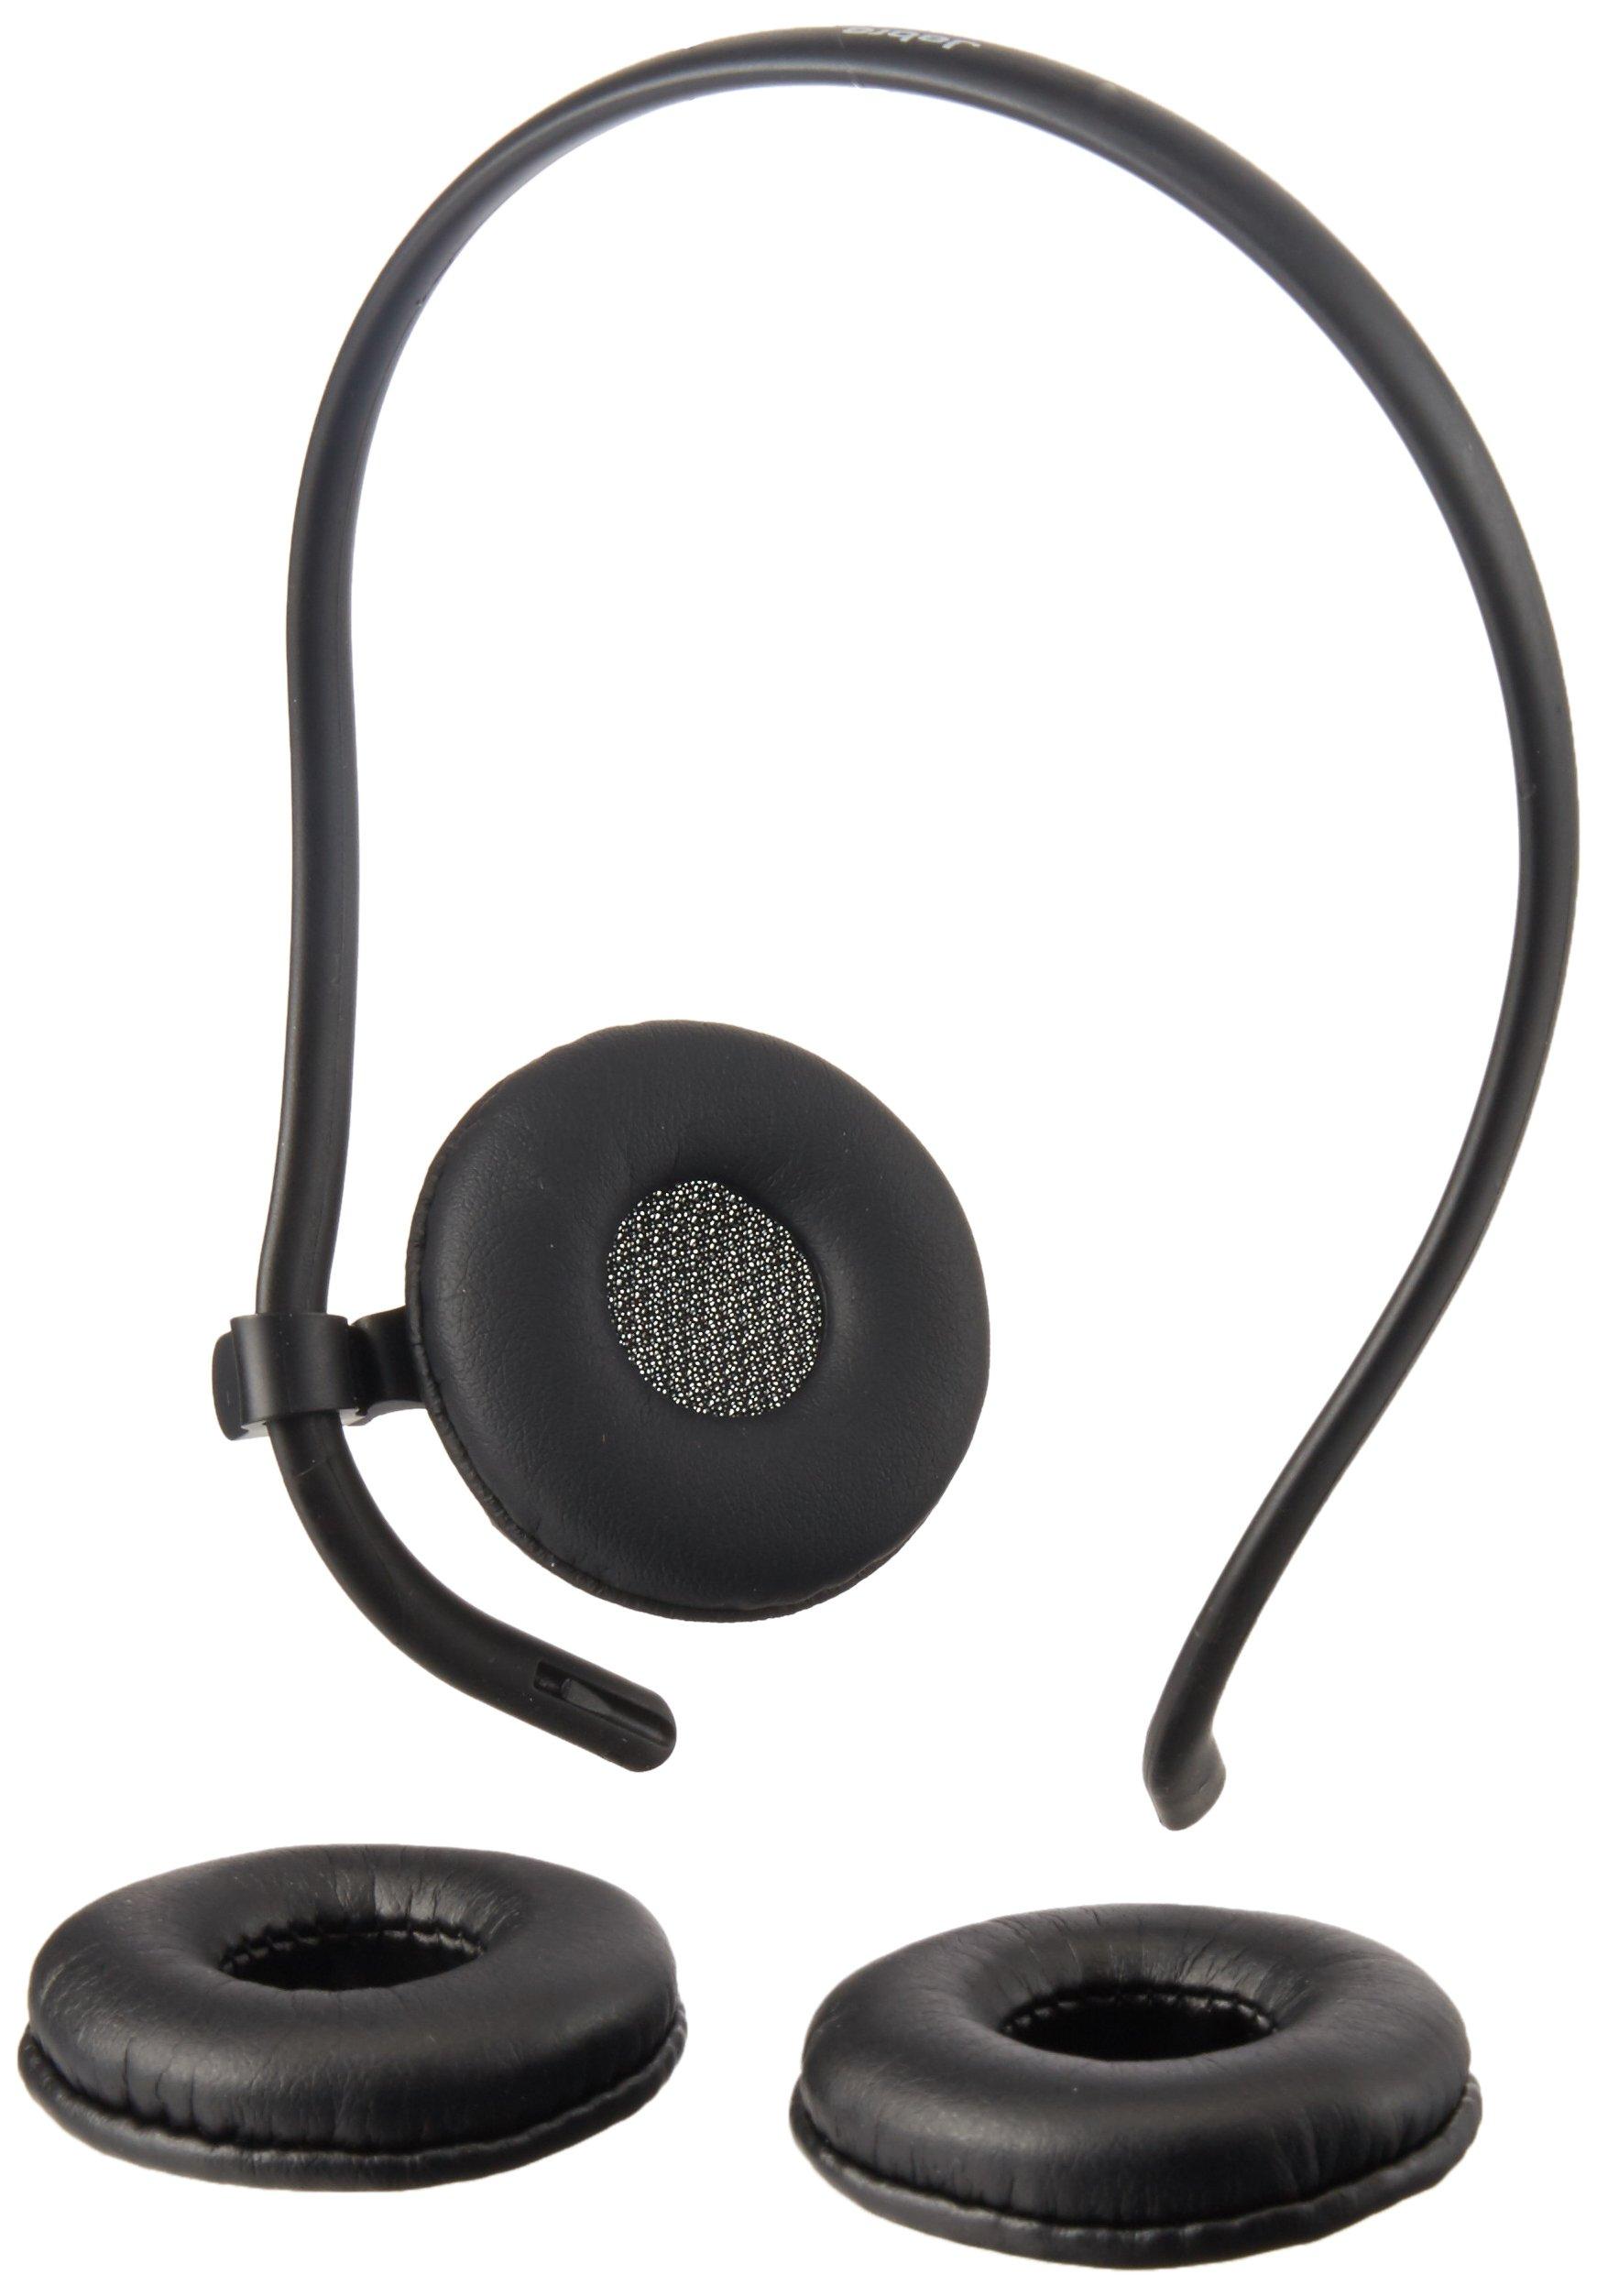 Jabra 14121-24 Neckband for Pro 9400 Series